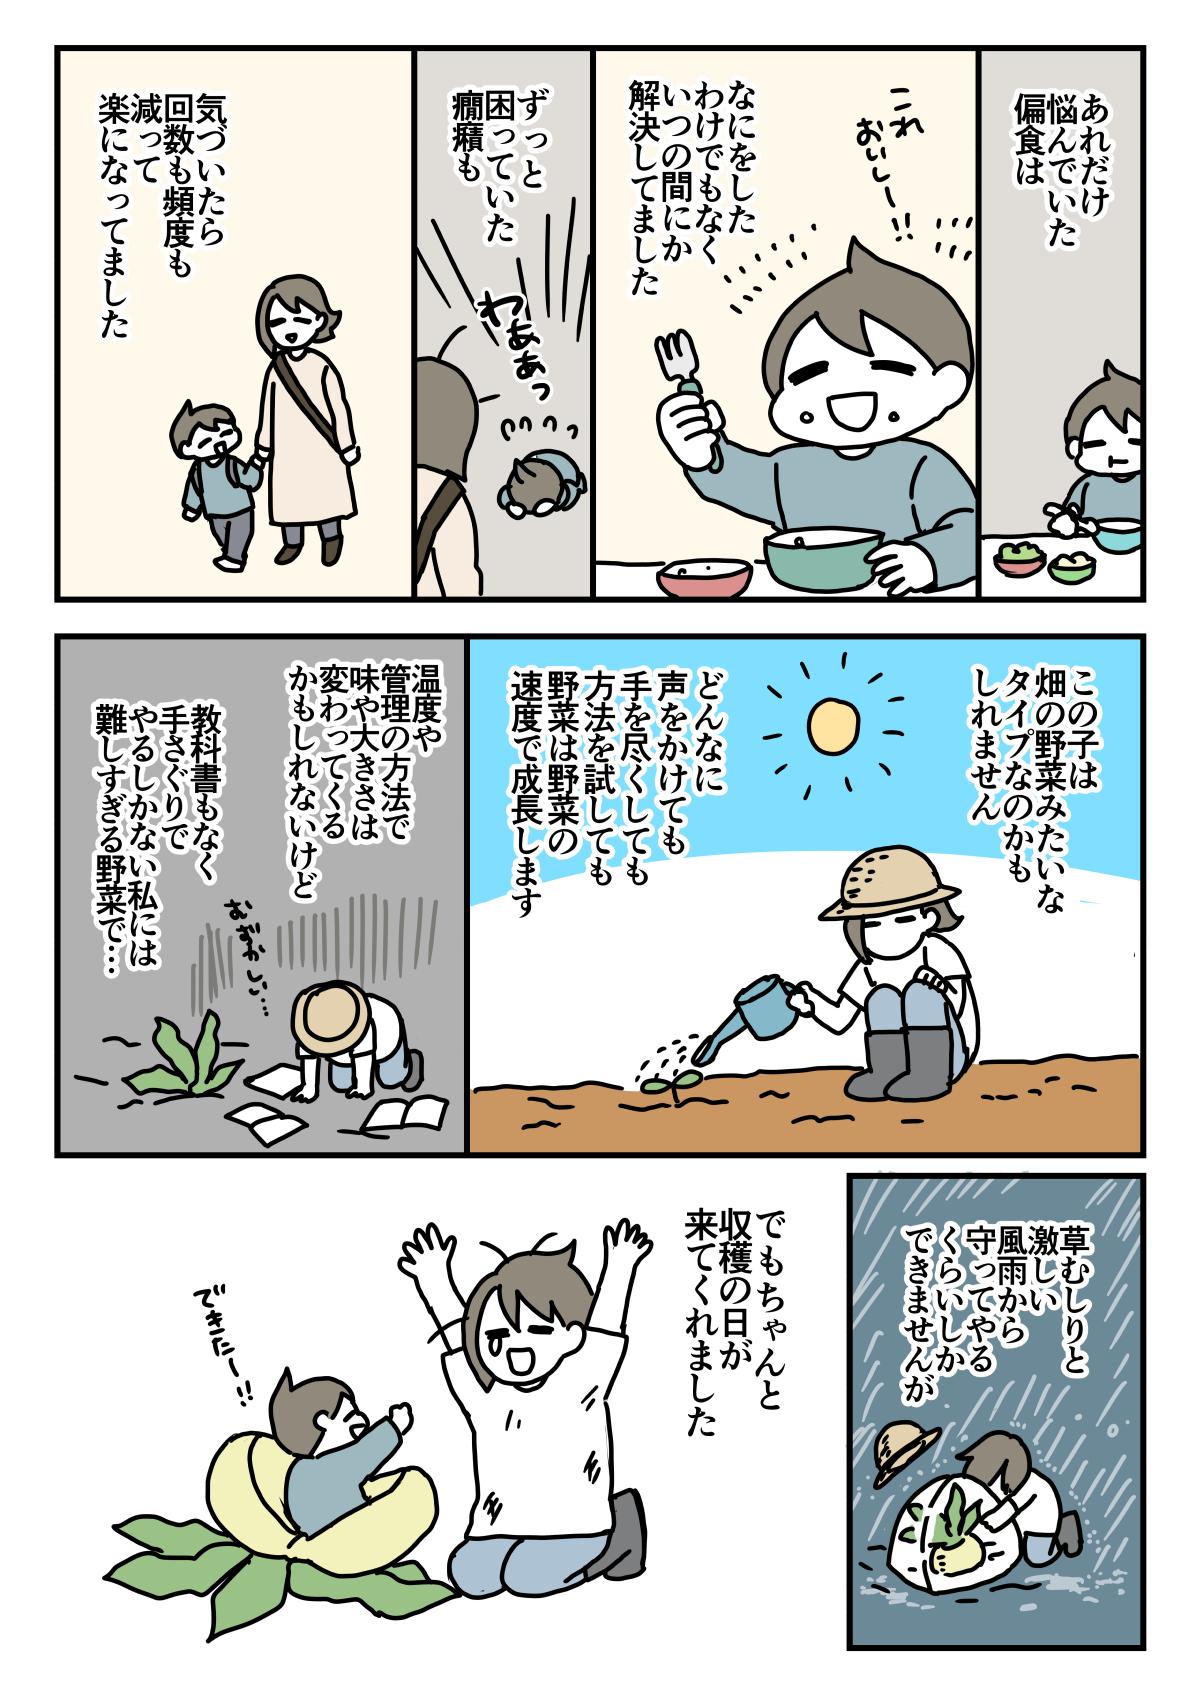 f:id:kanemotonomukuu:20170926171538j:plain